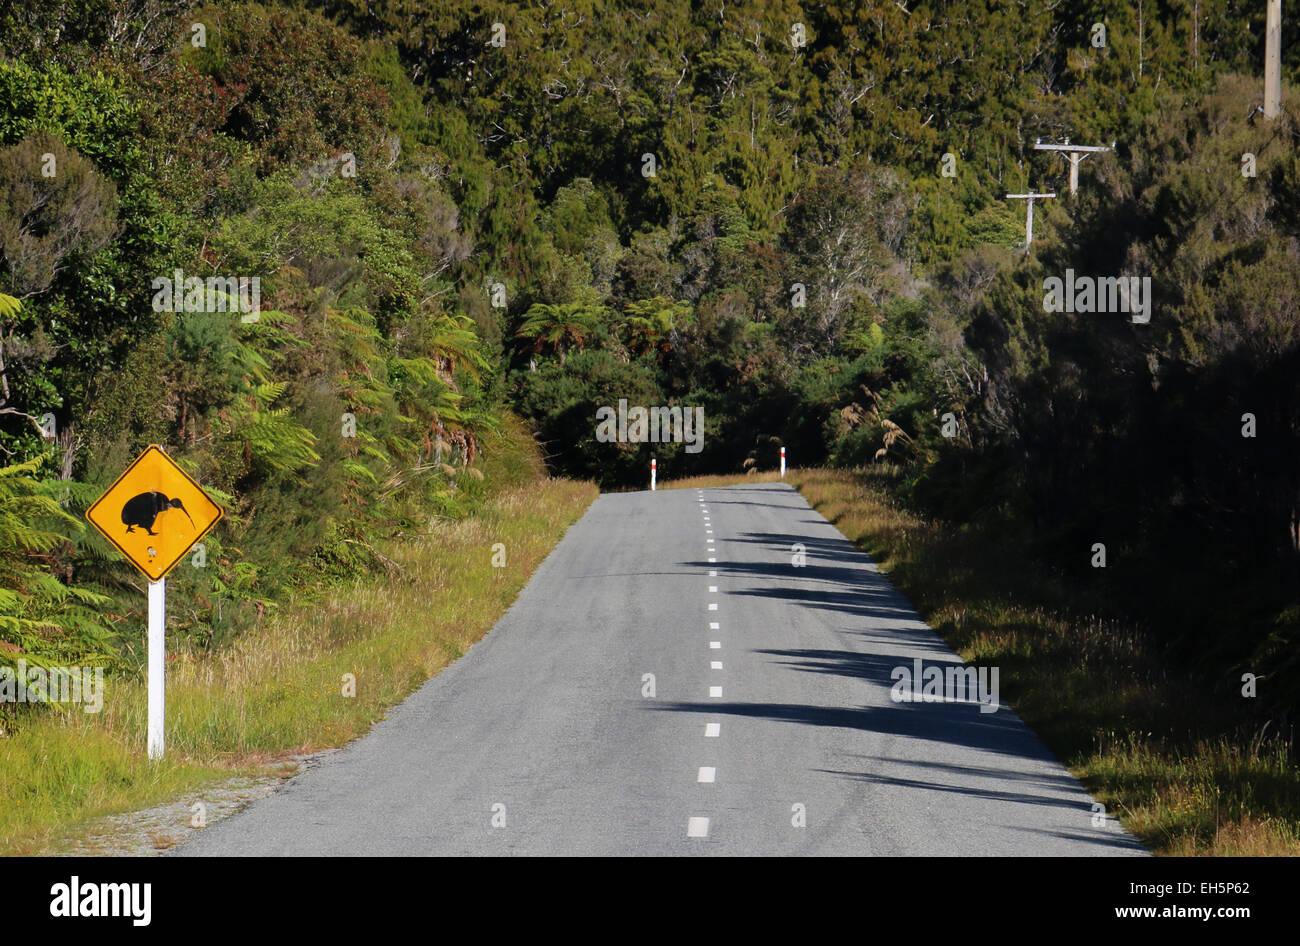 Kiwi crossing Road sign New Zealand - Stock Image